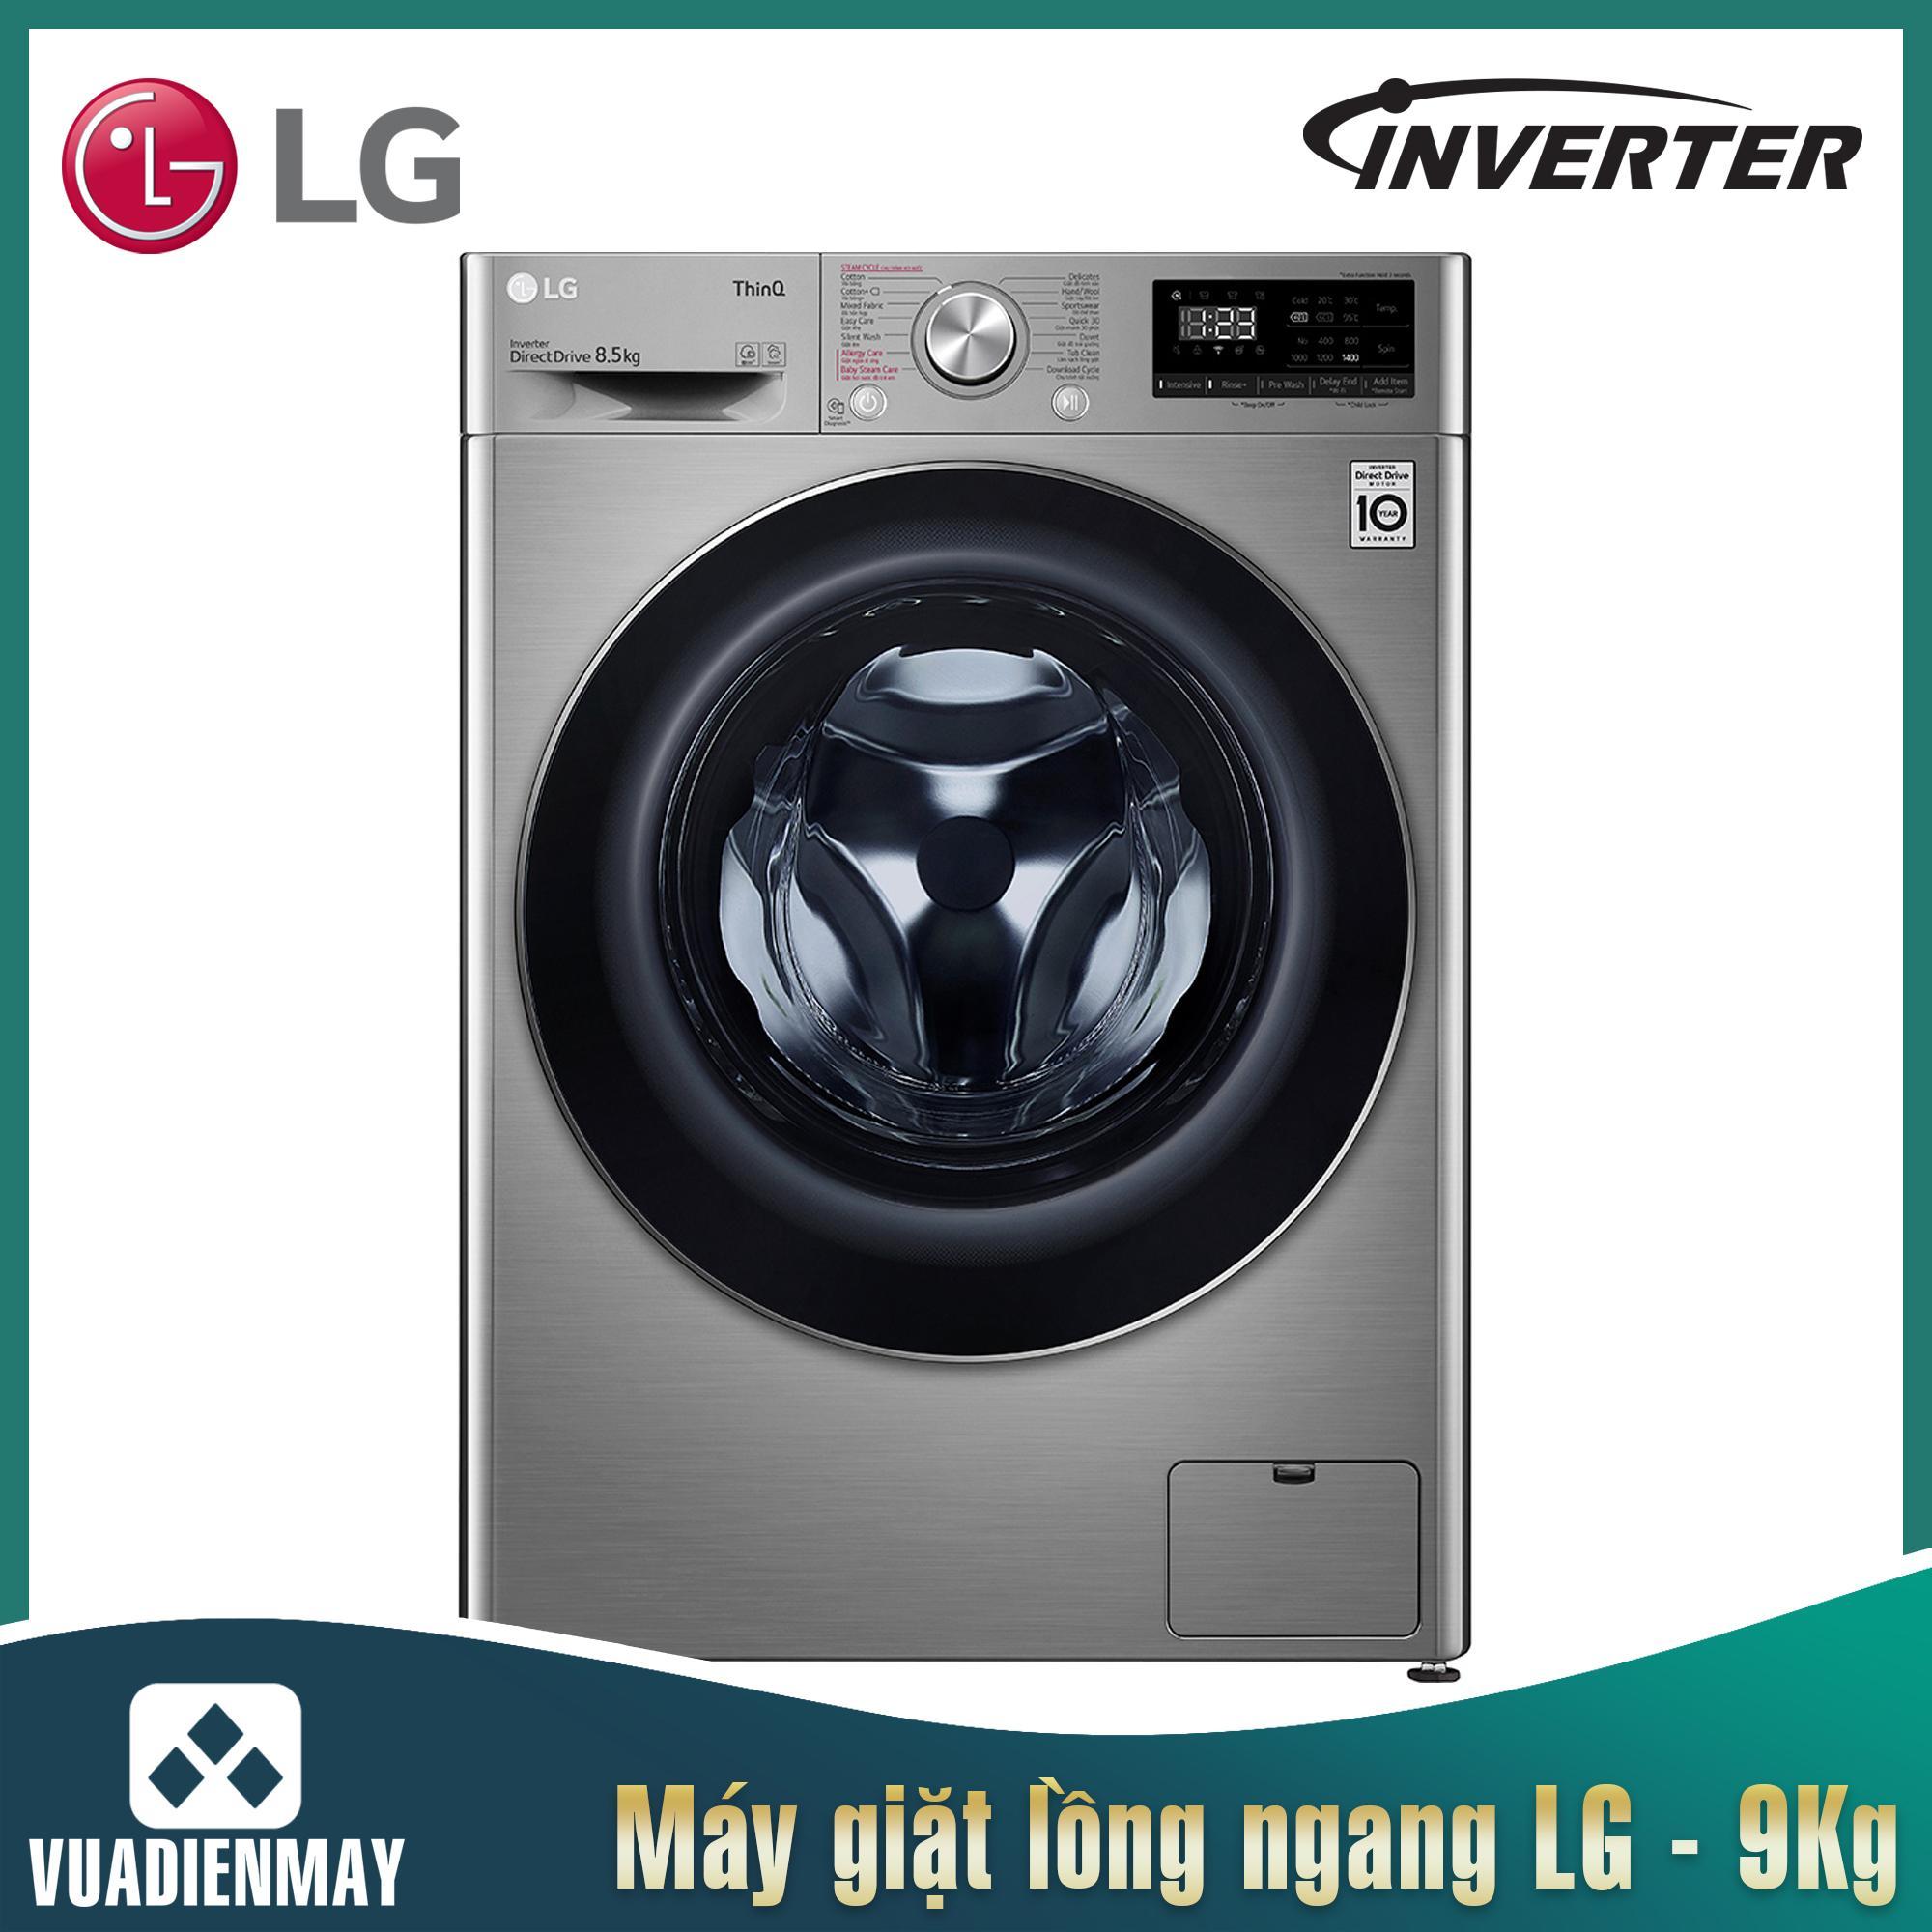 Máy giặt sấy LG lồng ngang 9 Kg Inverter